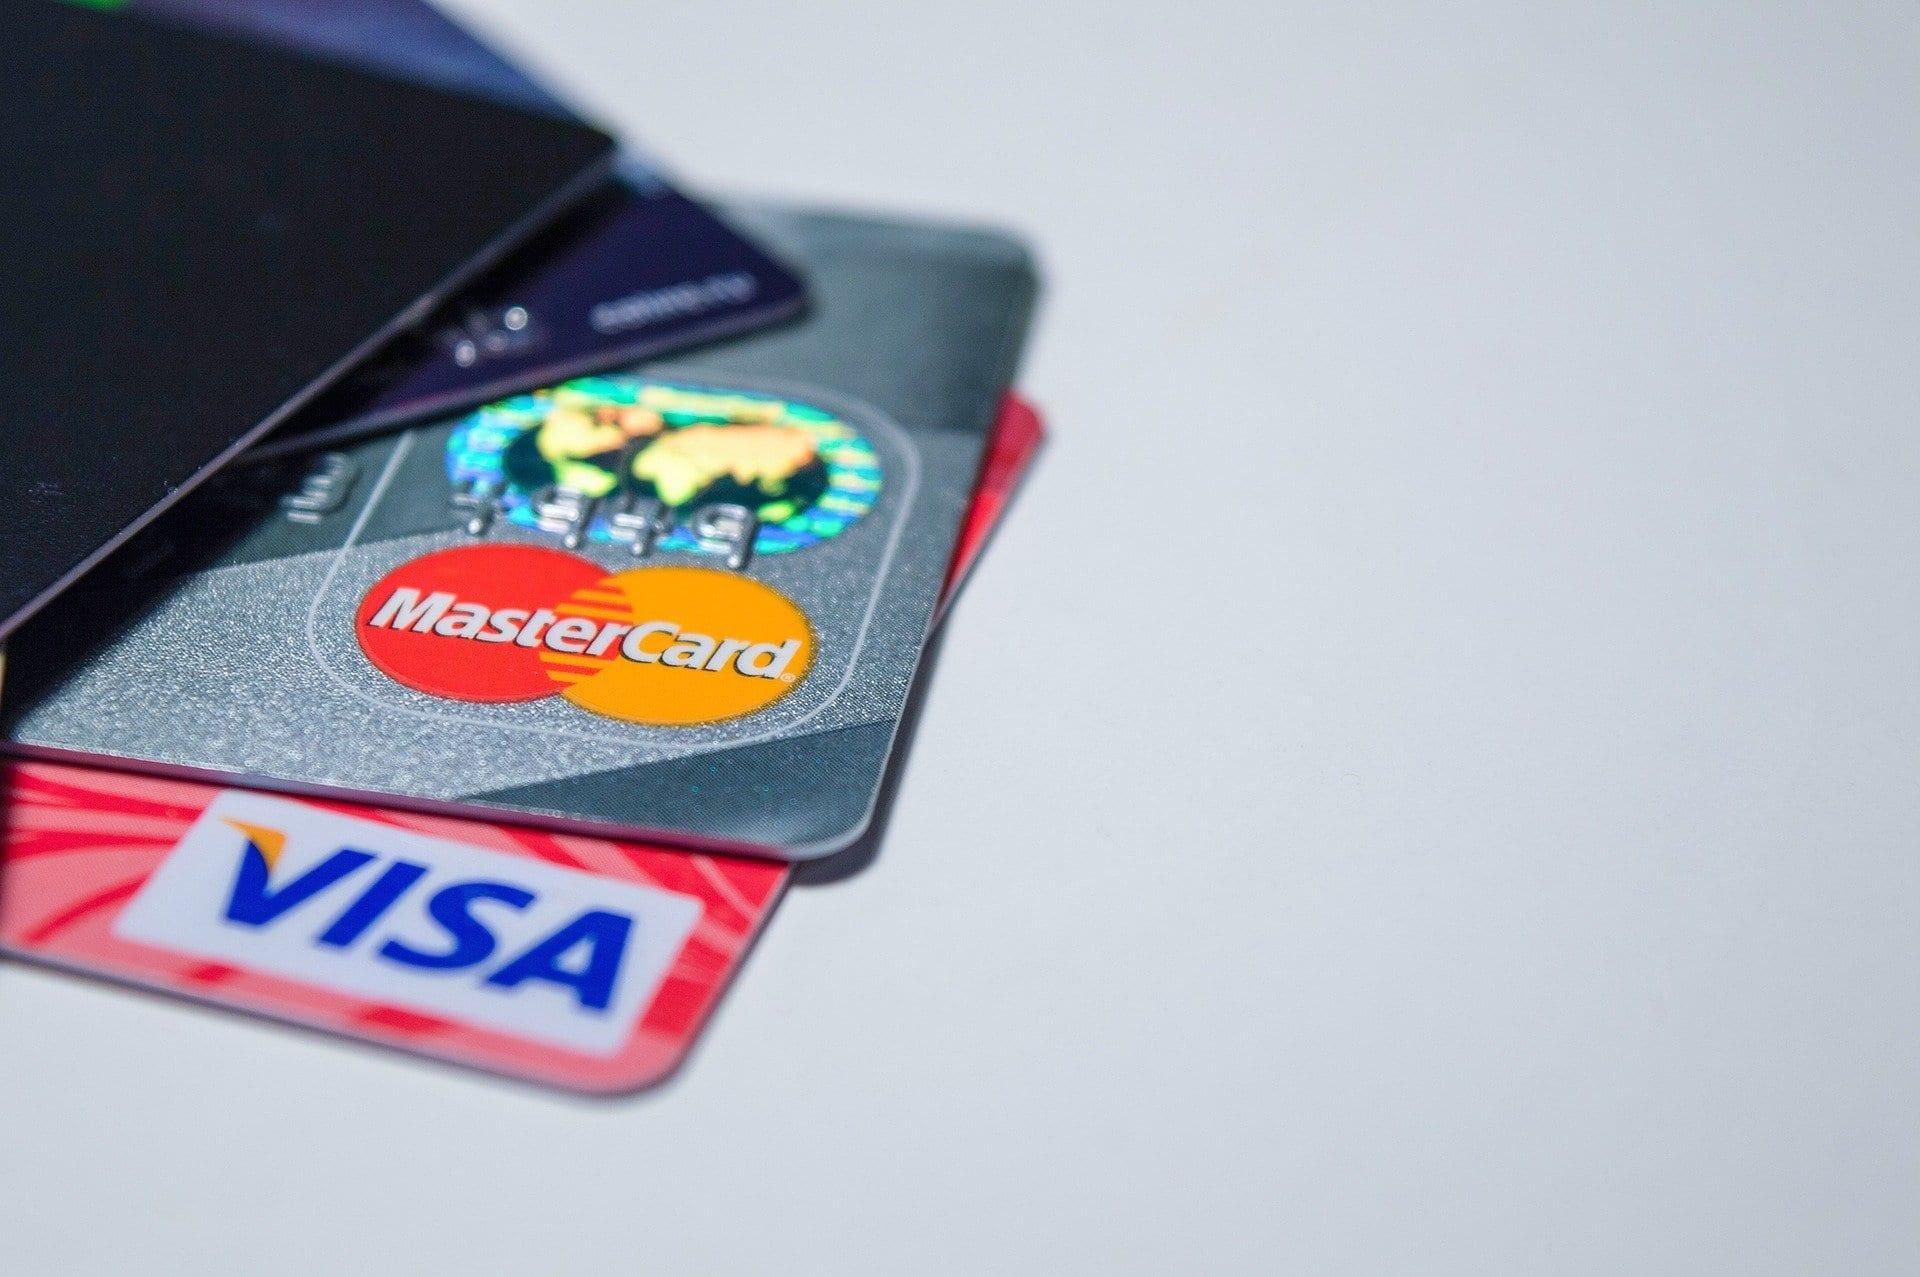 Crypto kopen met Creditcard, Visa of Mastercard